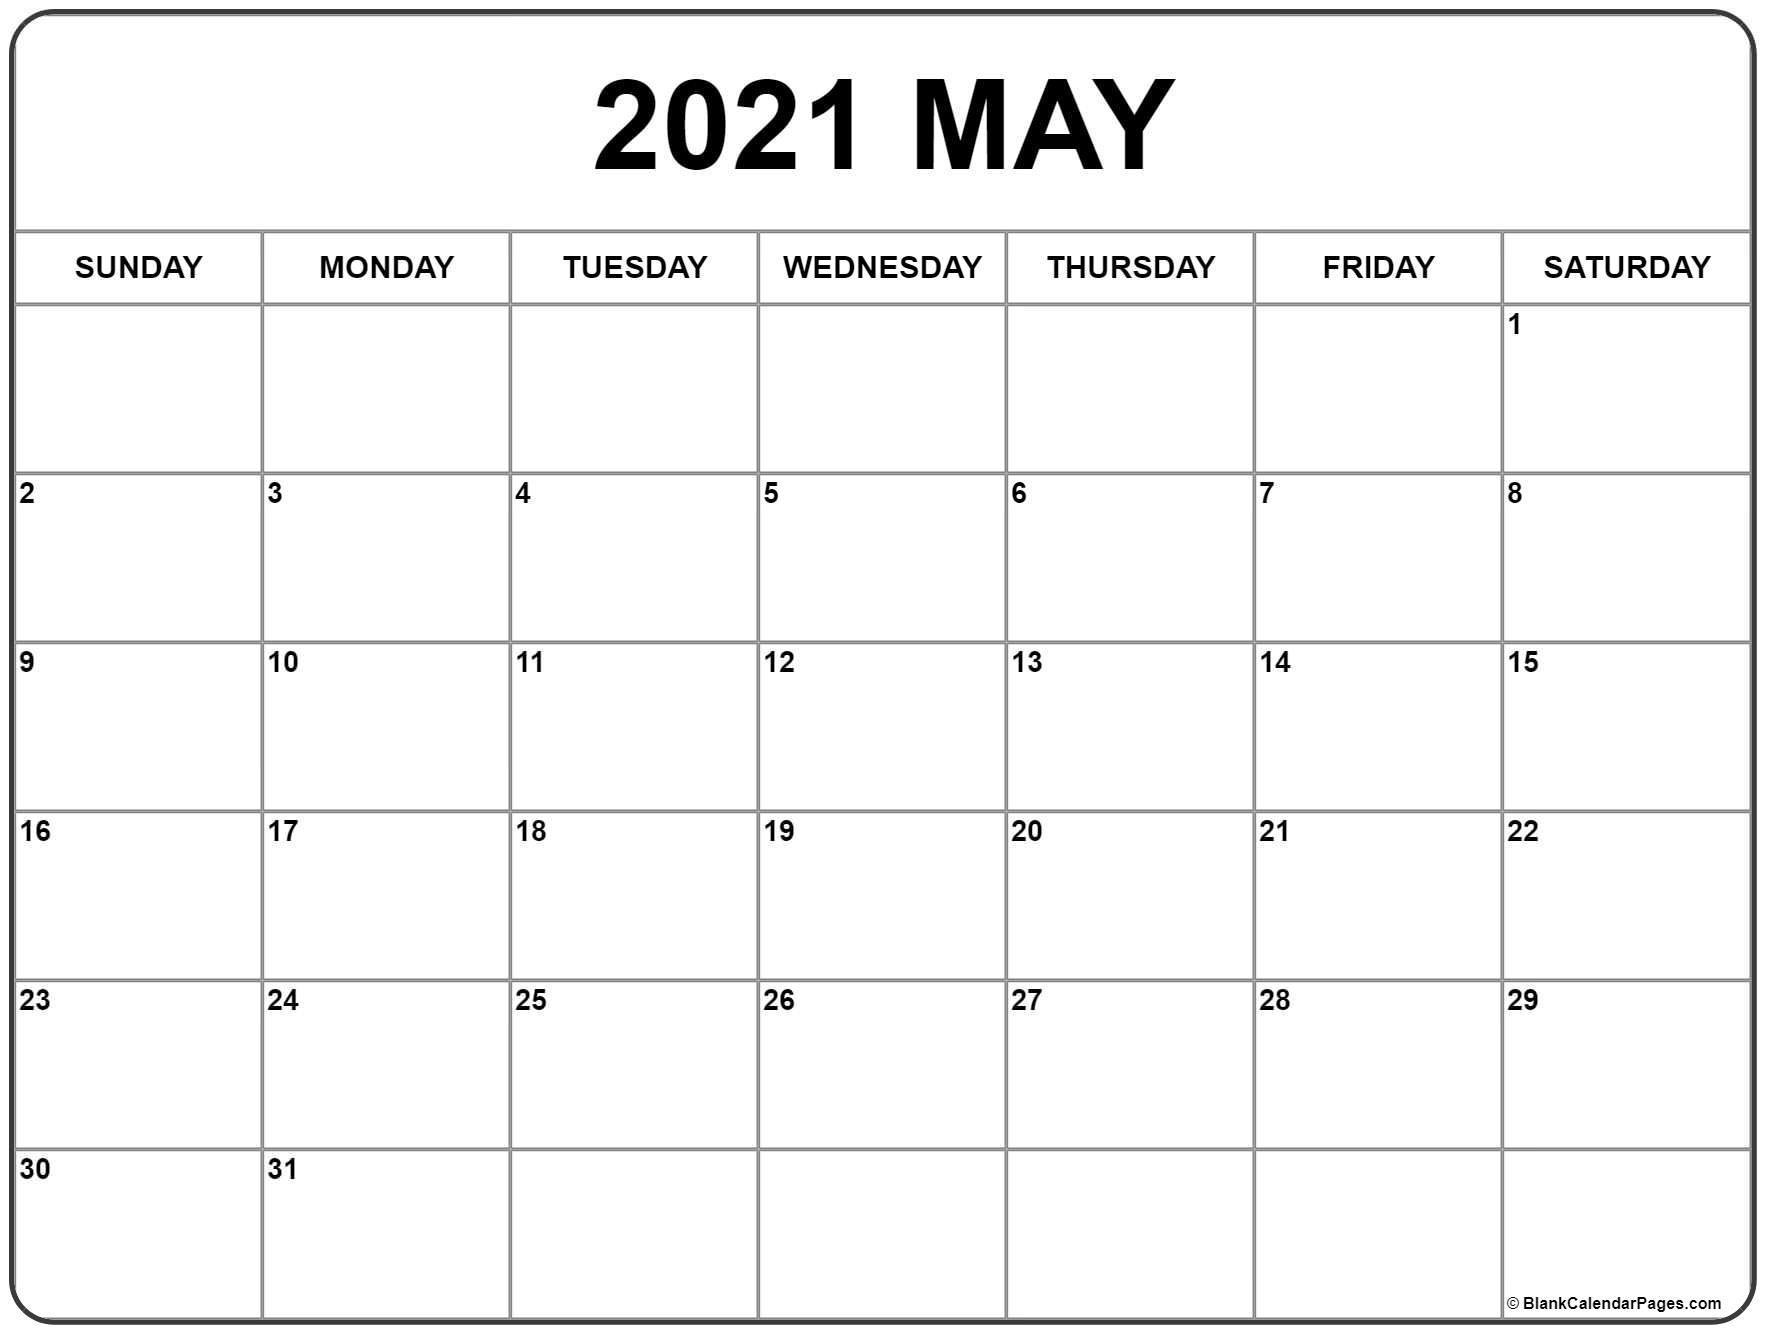 May 2021 Calendar | Free Printable Monthly Calendars  Monthly Calendar 2021